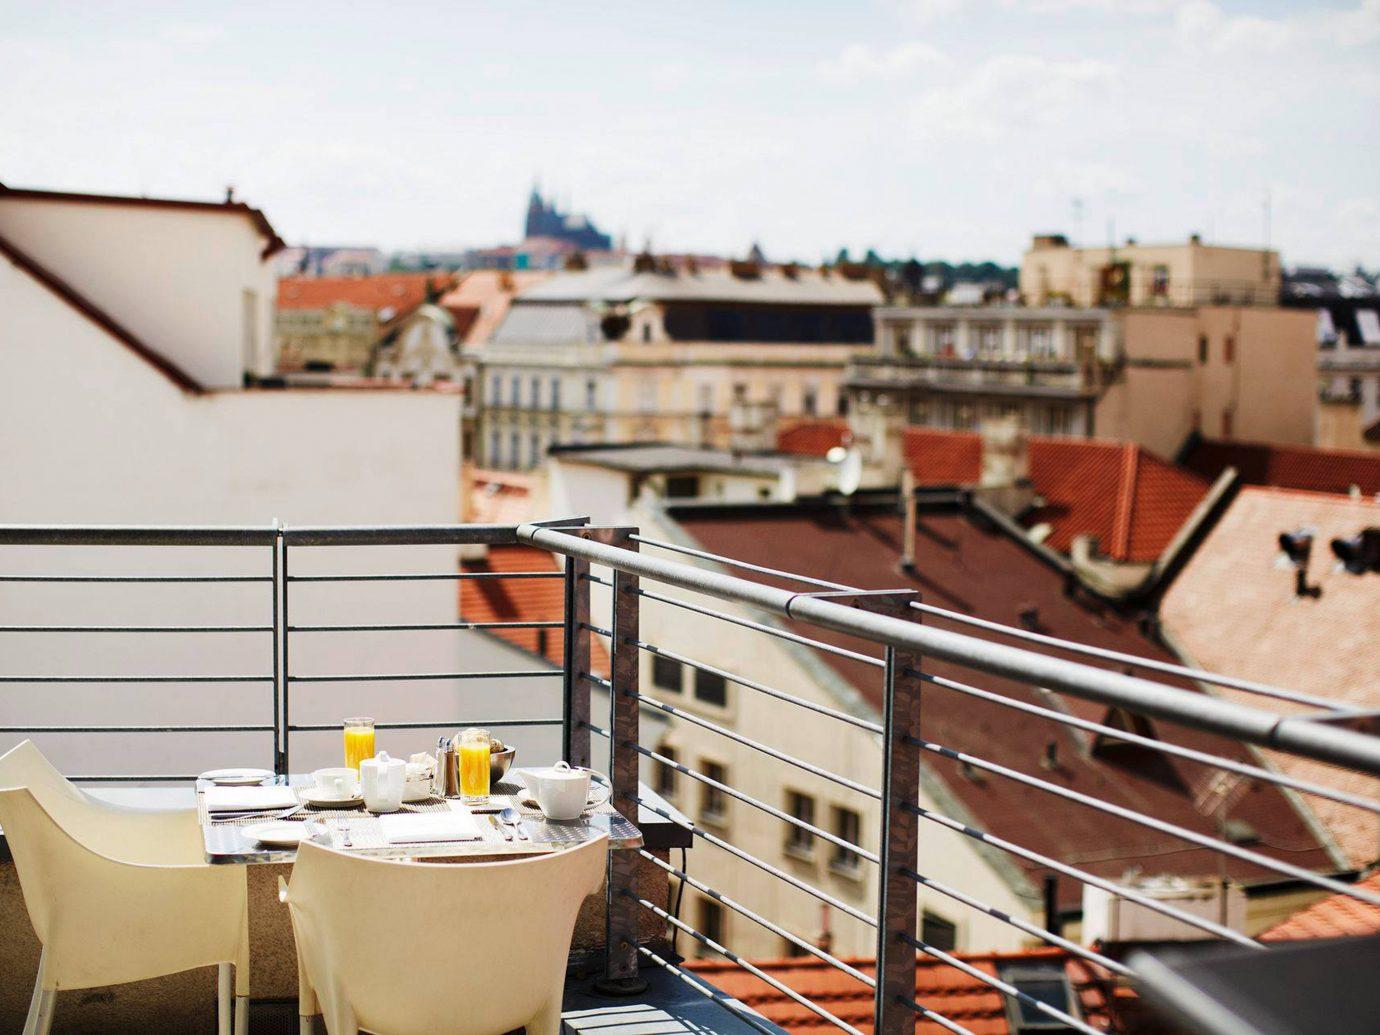 Balcony Buildings Dining Drink Eat europe Hotels Luxury Prague Romantic Scenic views vehicle Boat watercraft ship